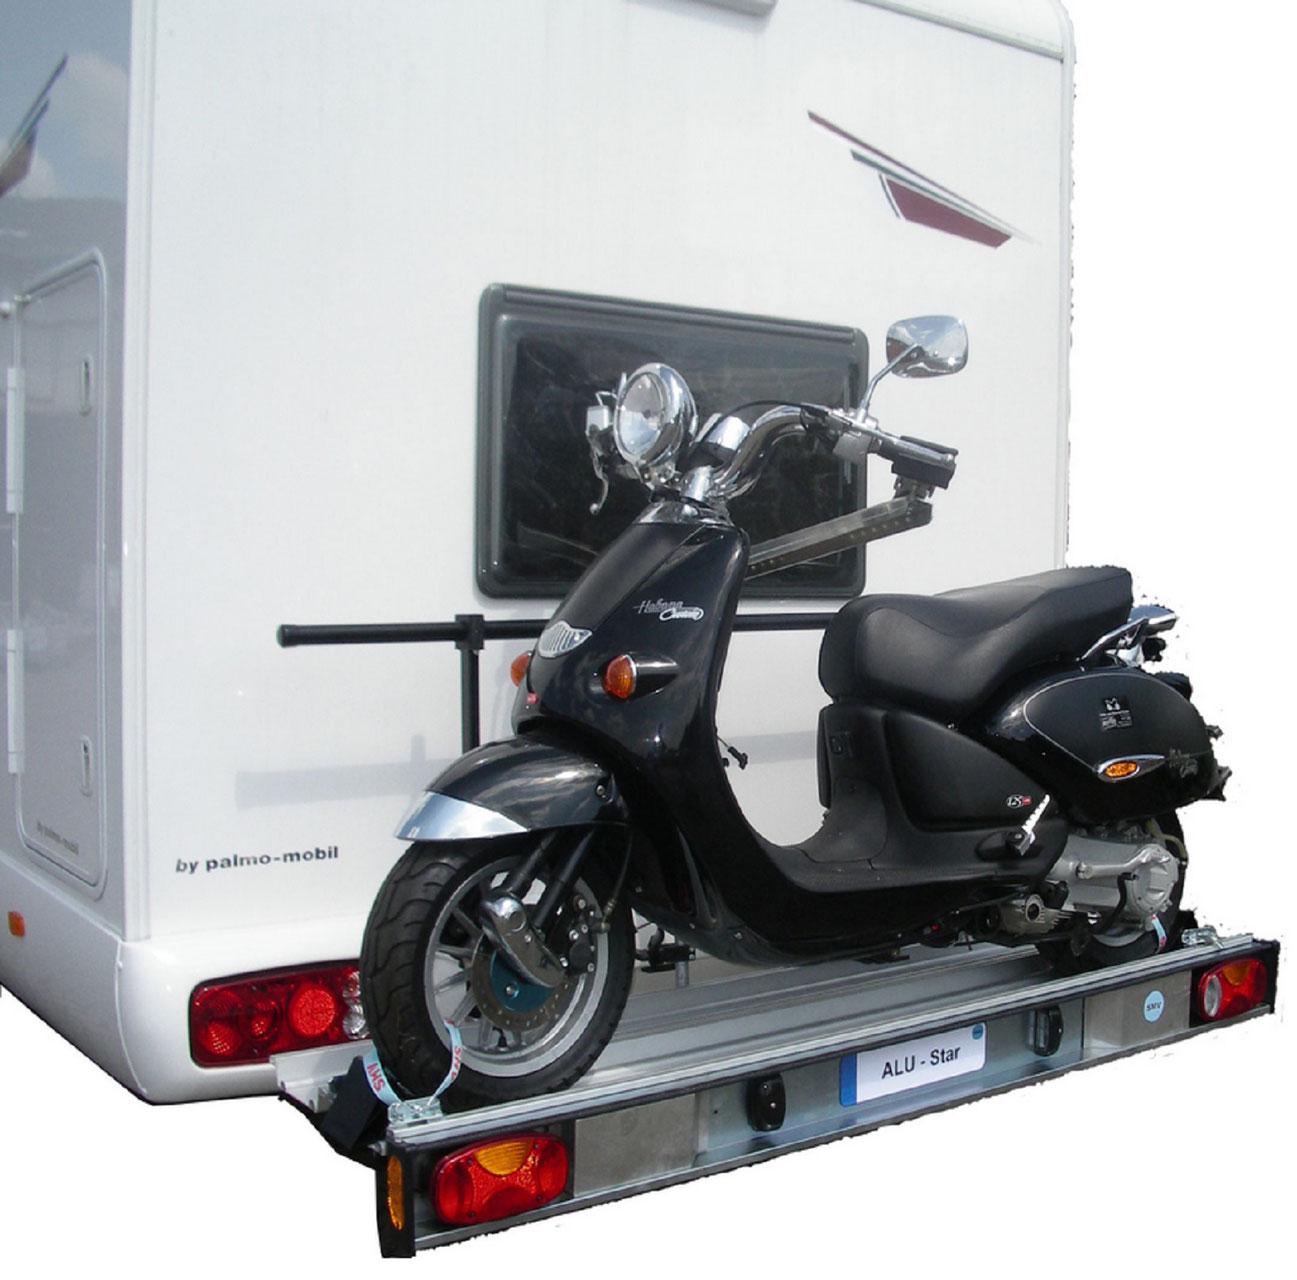 Details zu Motorradträger Rollerträger Nutzlast 9kg Fiat Ducato 9  Wohnmobile